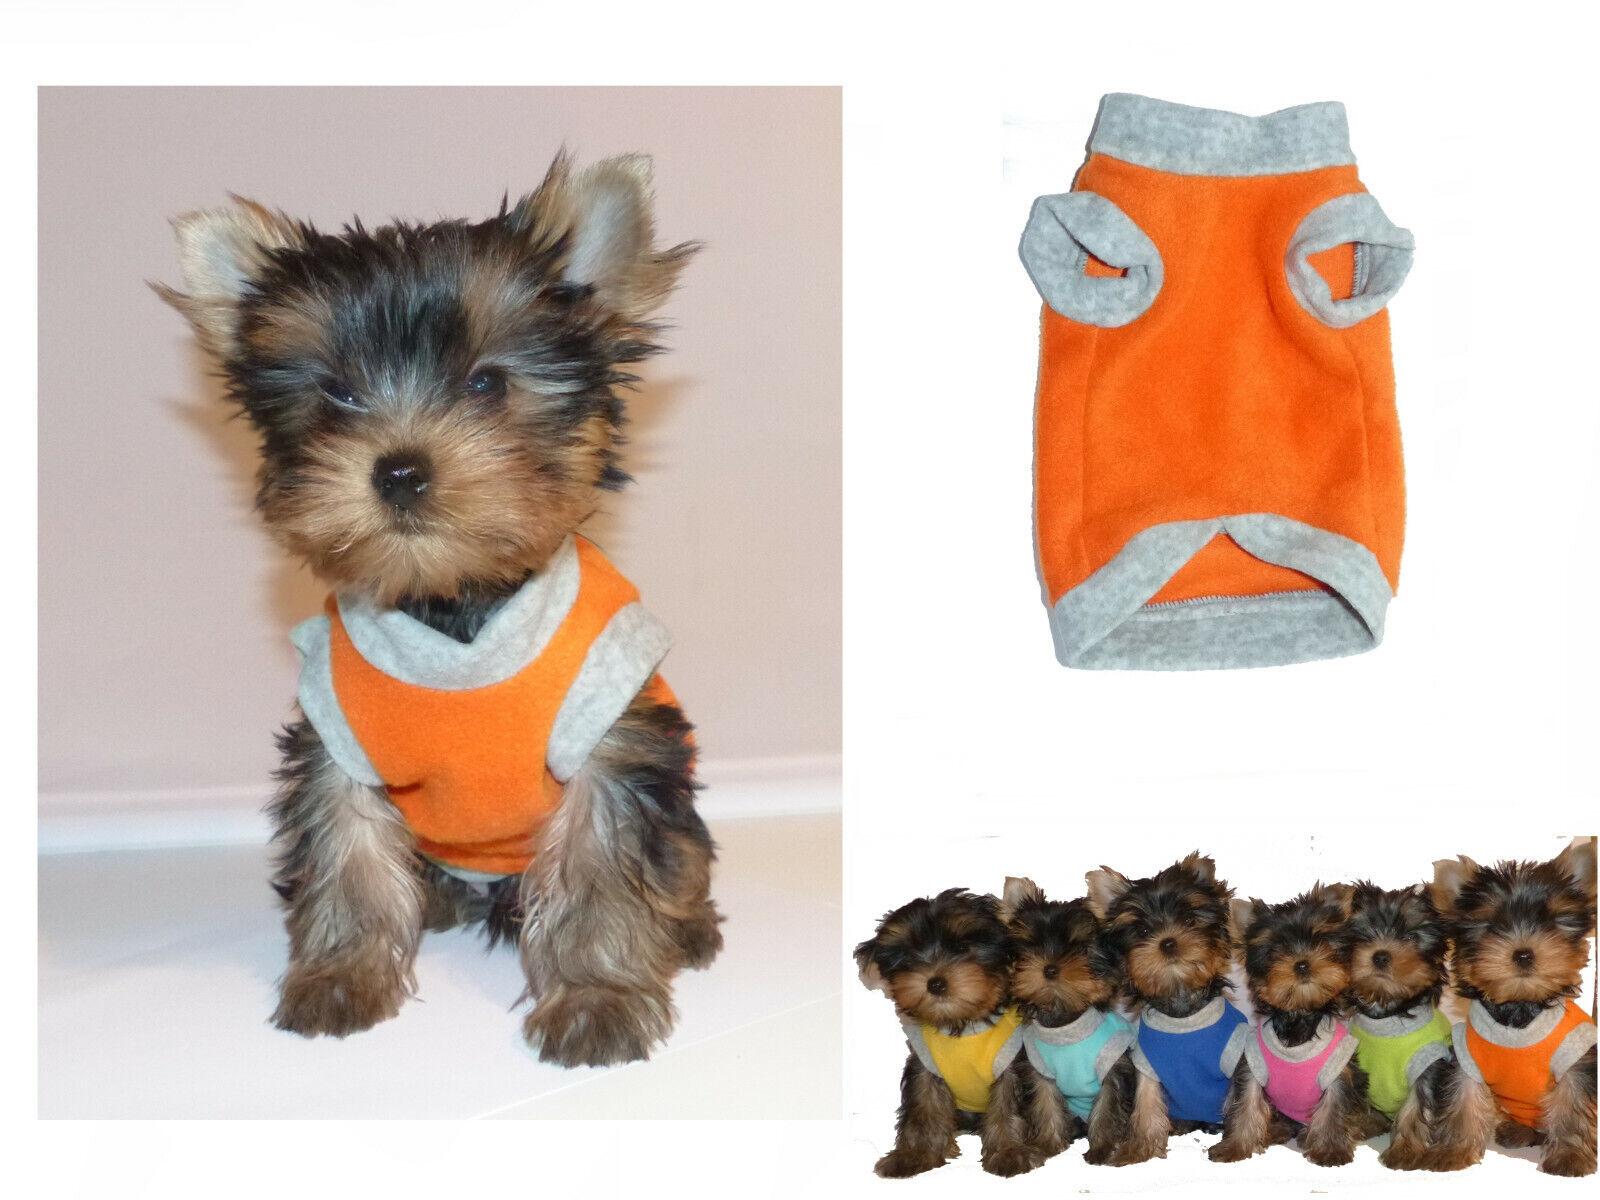 Hundeshirt Hundepullover nach WUNSCH Hundekleidung XXXS XXS XS Yorkie Chihuahua